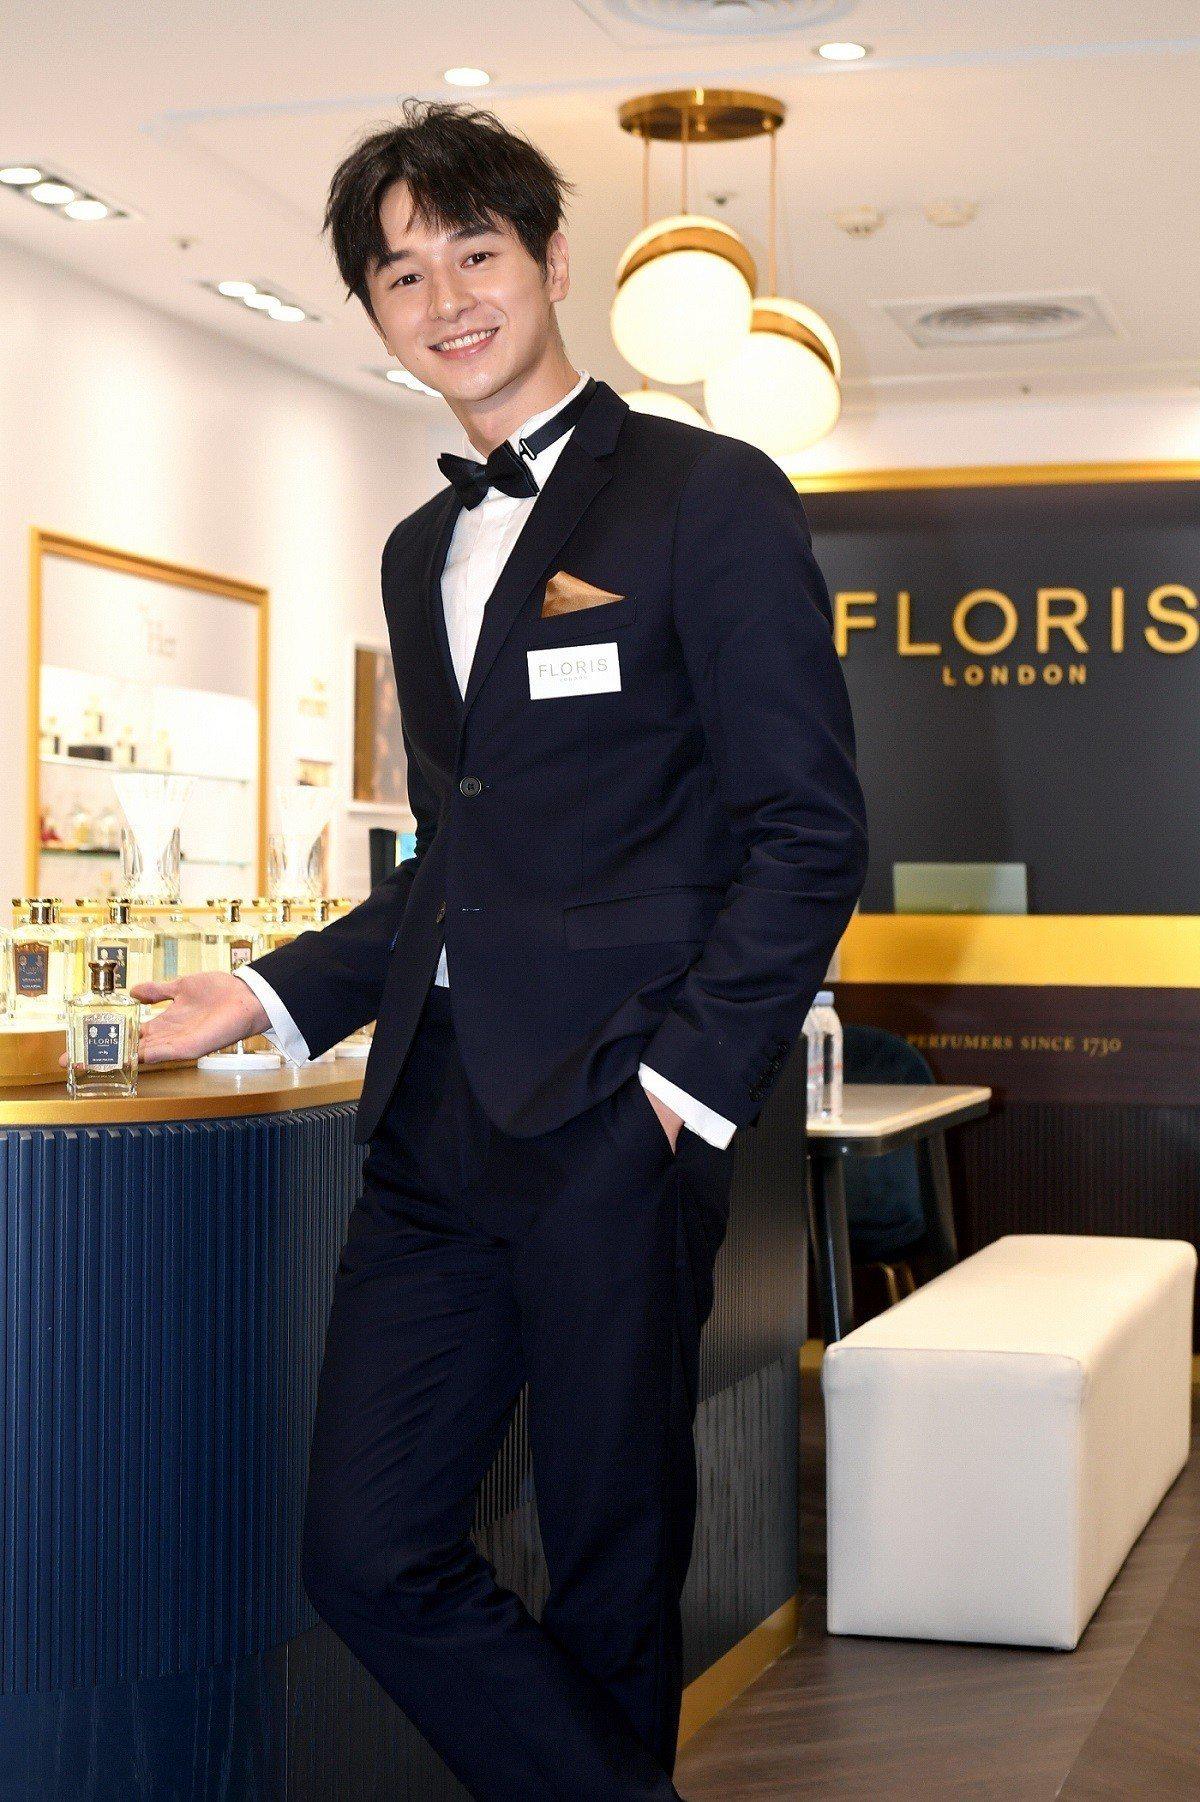 FLORIS LONDON亞洲首發形象旗艦店開幕,邀請張軒睿化身英倫王子,暢聊最...